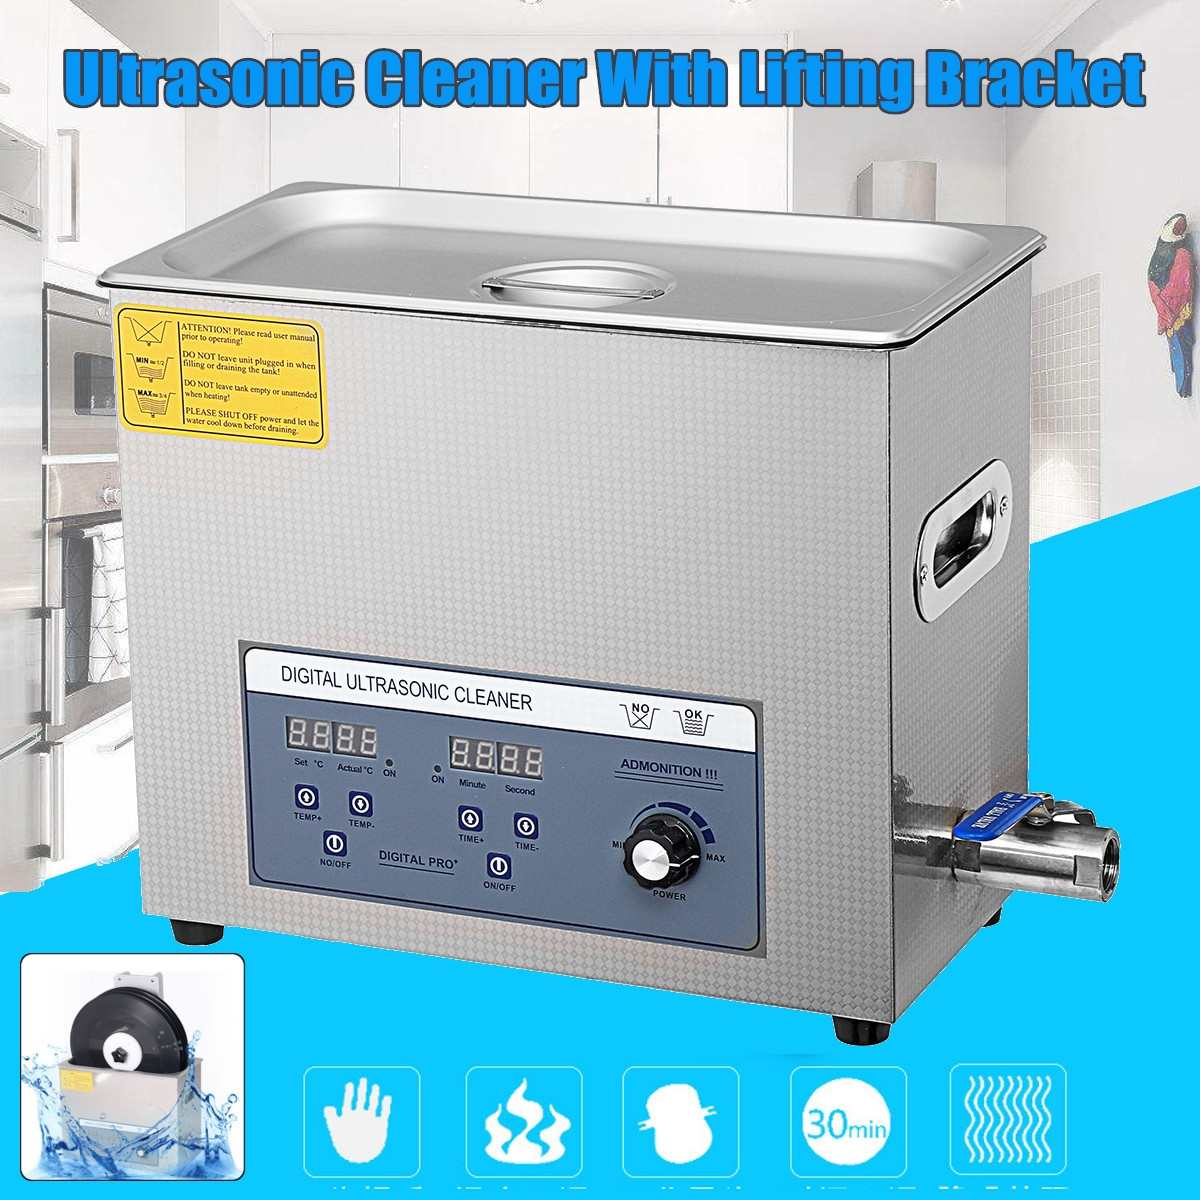 Profissional de 6l 220 v liftable lp álbum disco digital ultra sônico mais limpo vinil registro lavagem ultra som máquina limpeza portátil - 3